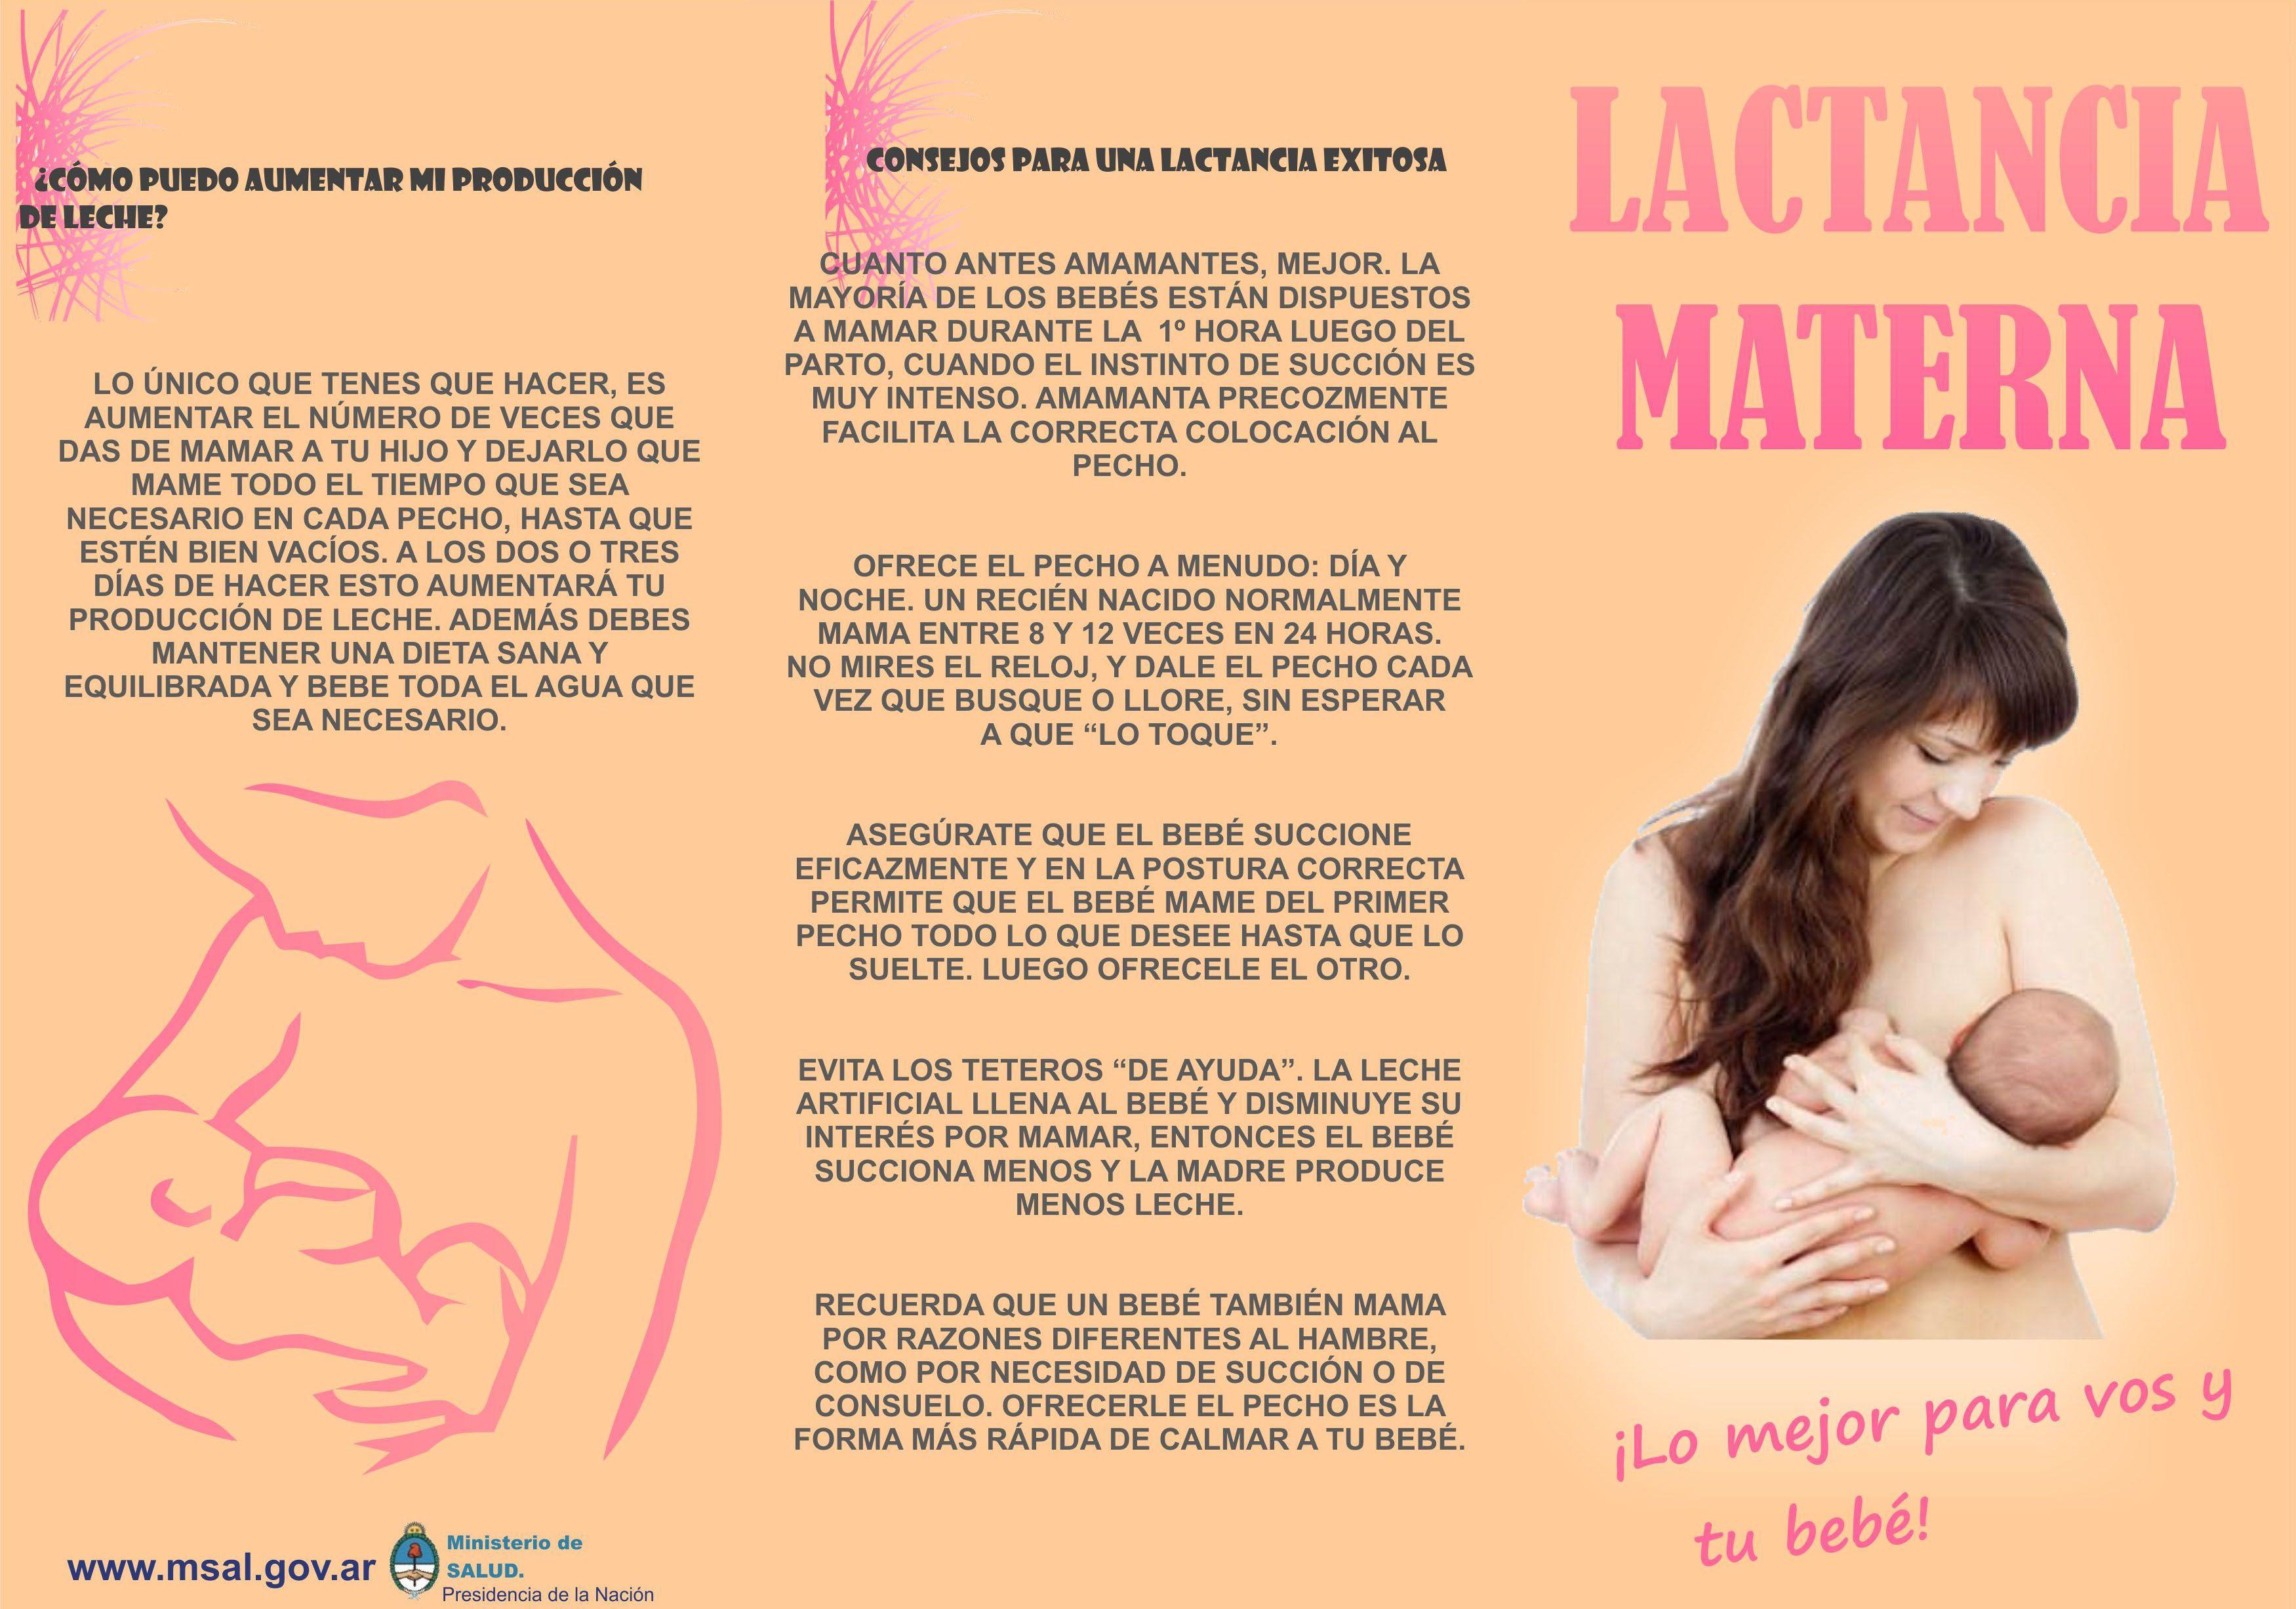 Para lactosa amamantan mujeres sin dieta